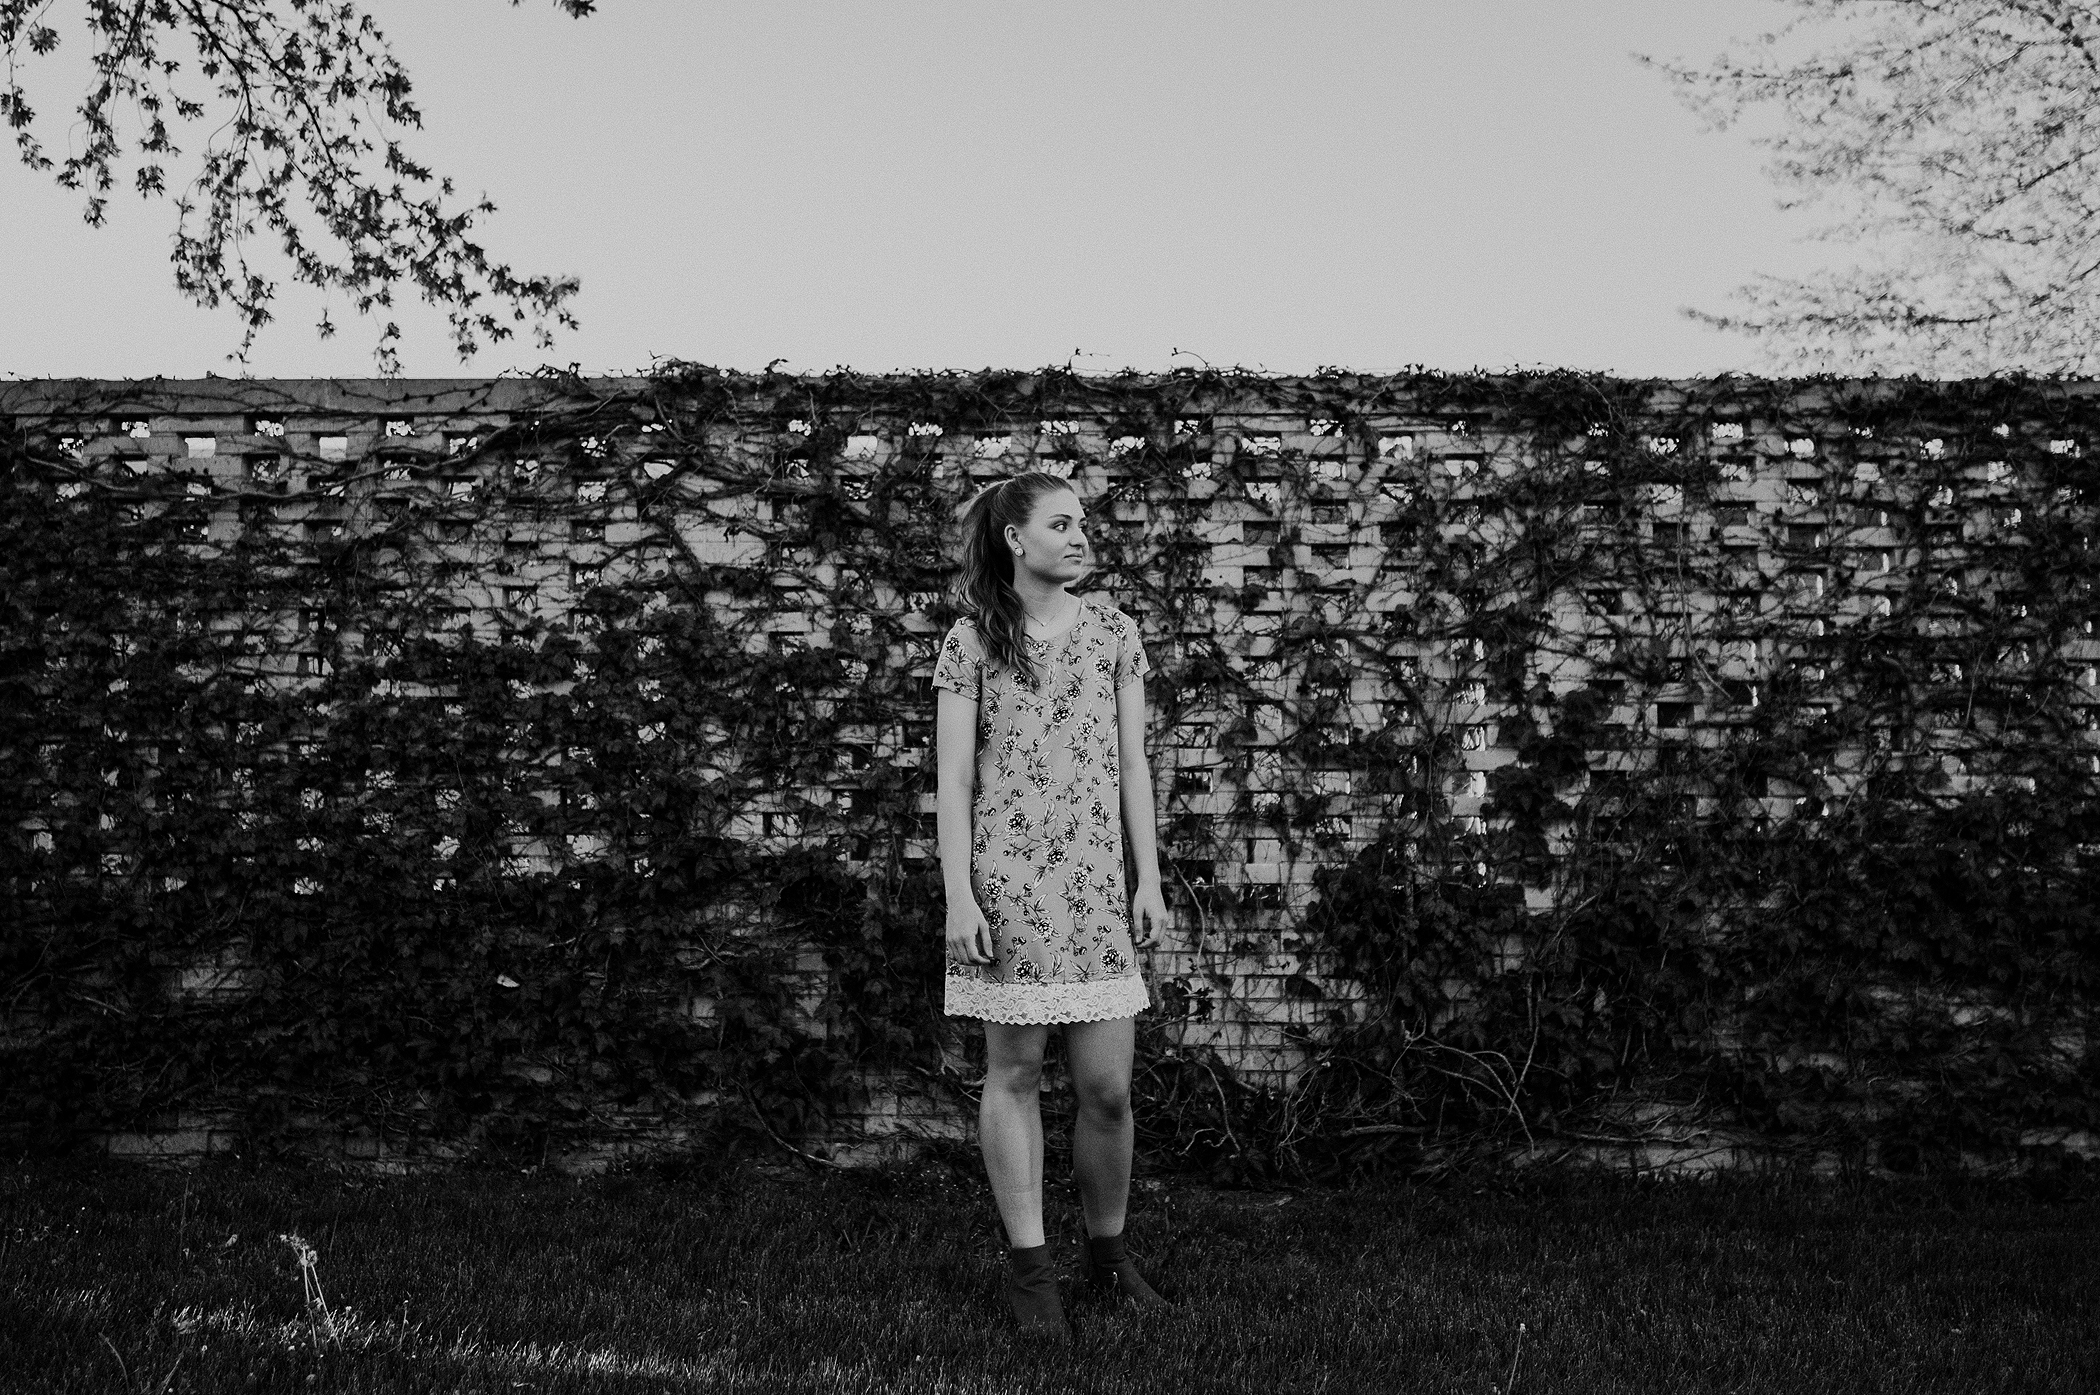 kaylie-sirek-central-nebraska-senior-portrait-photographer-photography-grand-island-kearney-hastings-lincoln-33.png